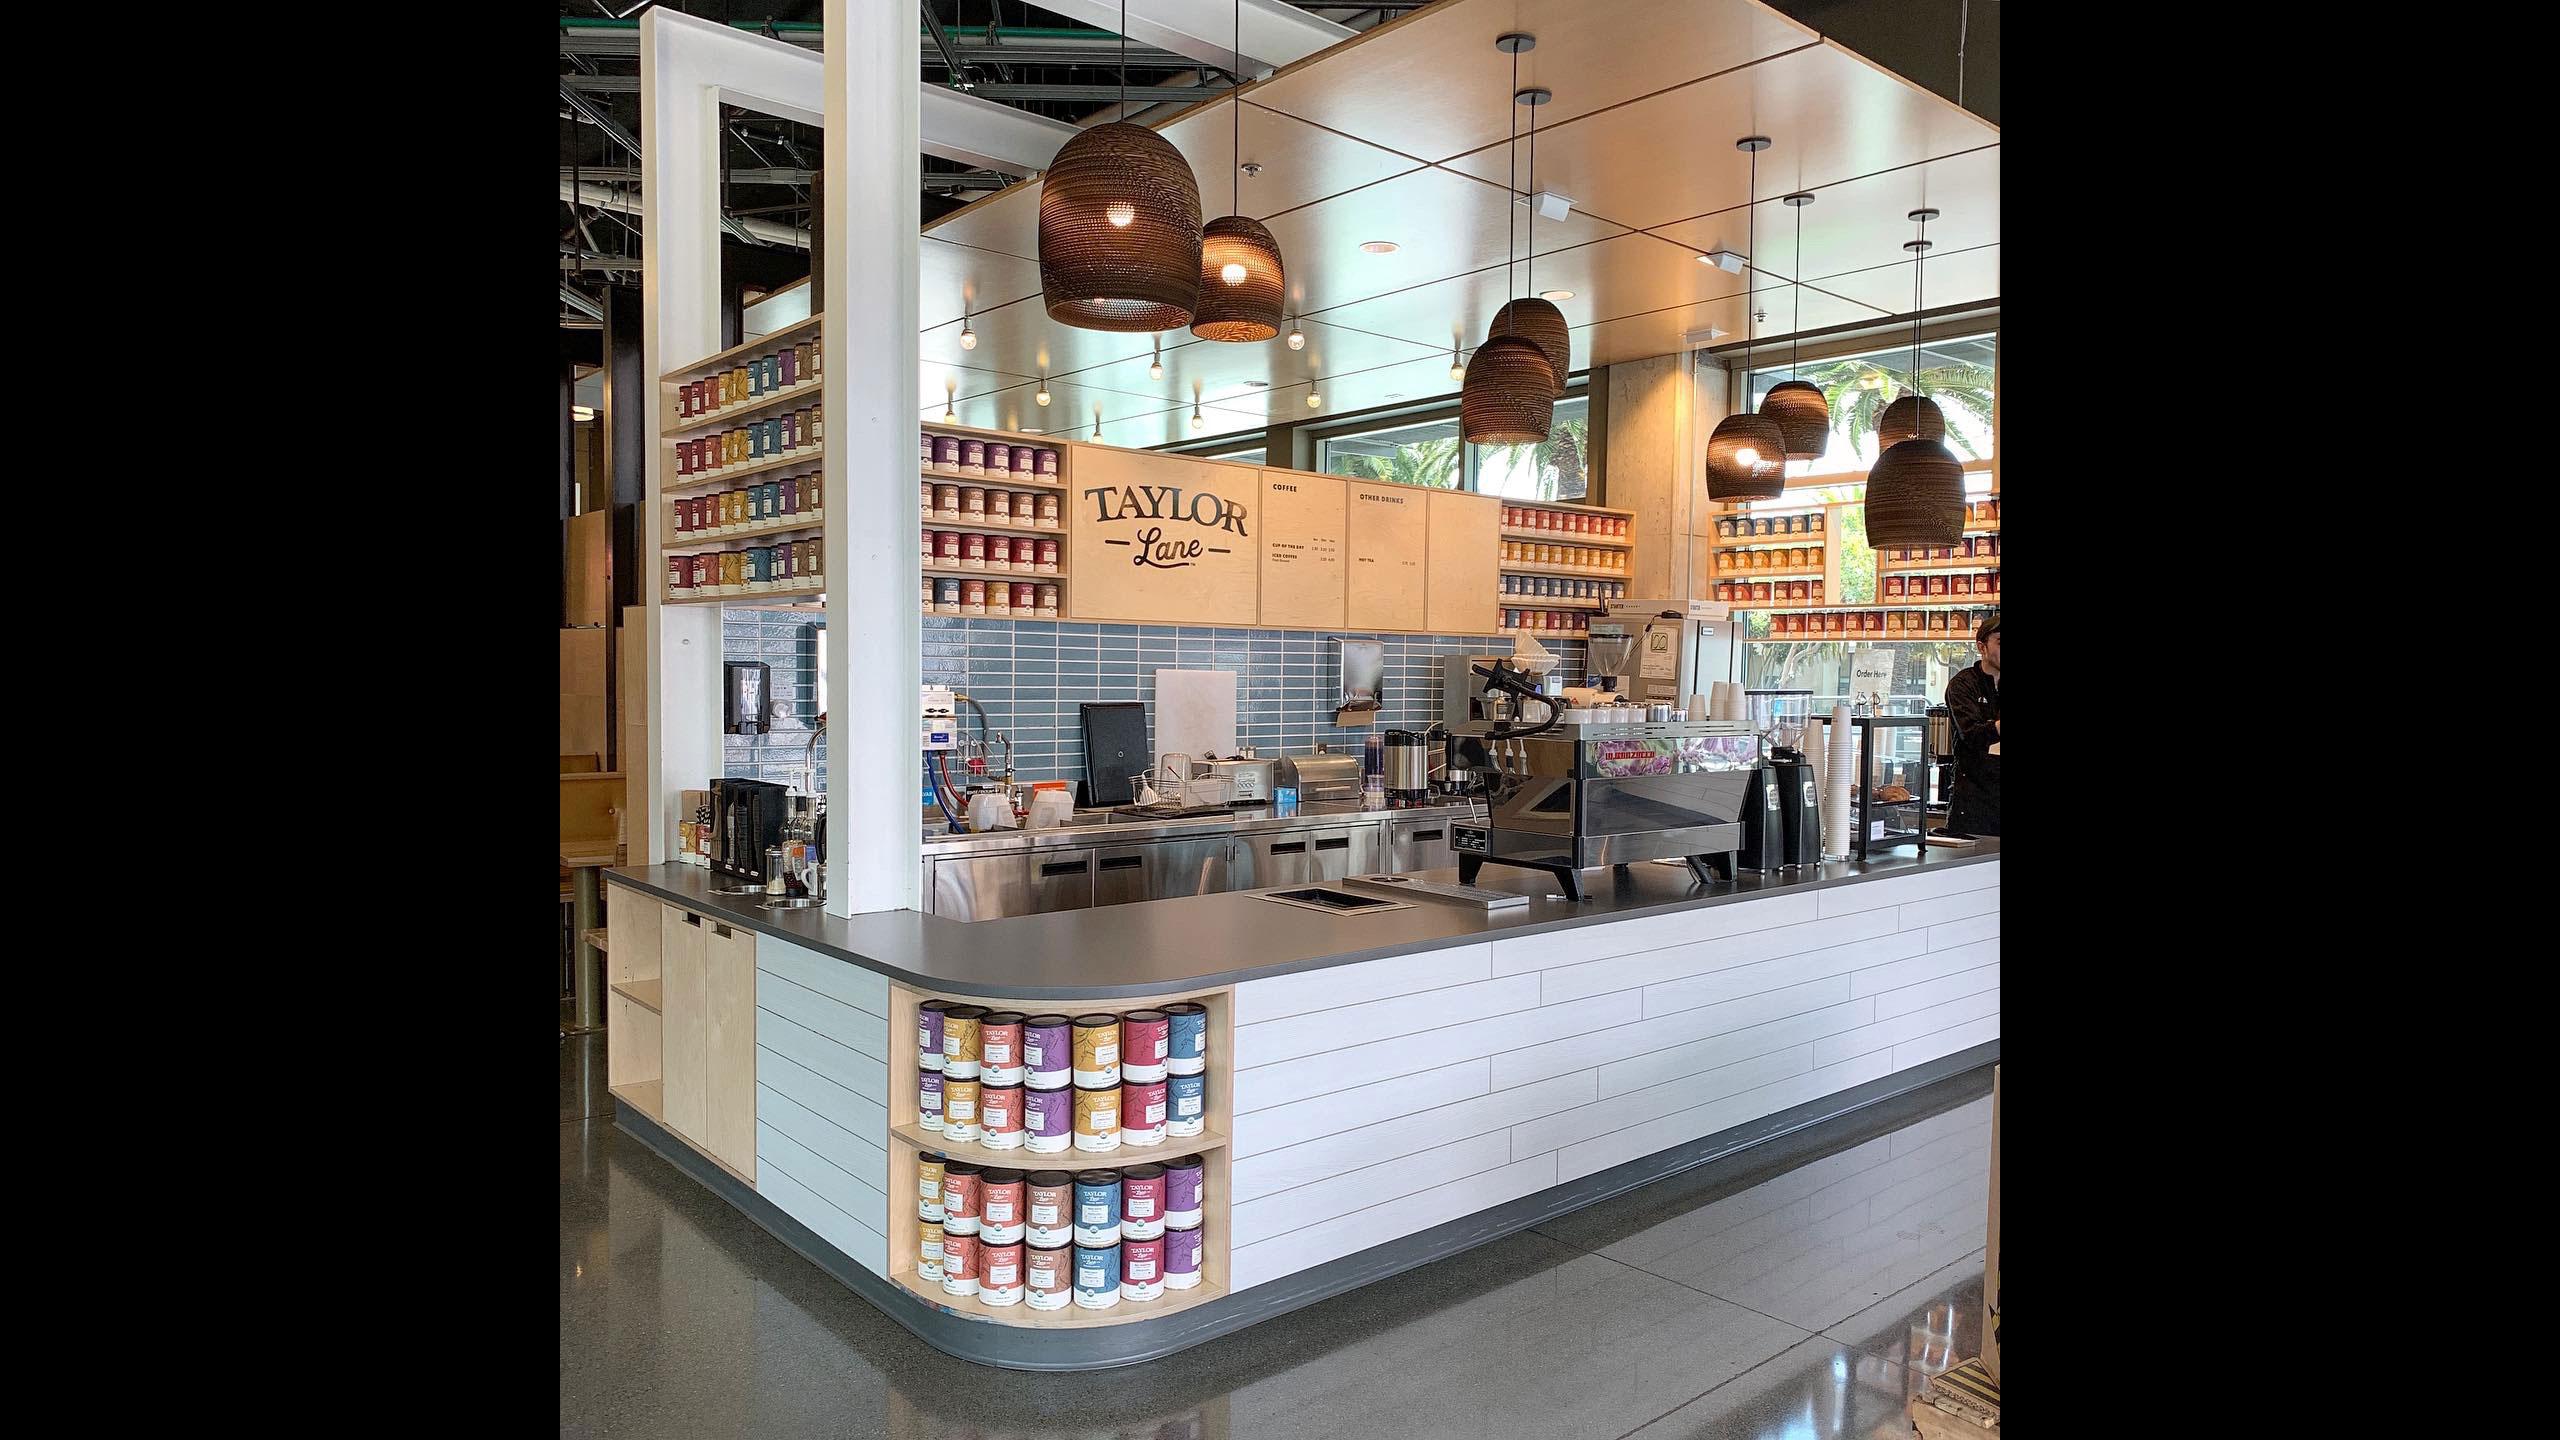 Coffee-Shop-Design-Taylor-Lane-2-Coffee-Counter-grey-countertop-blue-and-white-tile